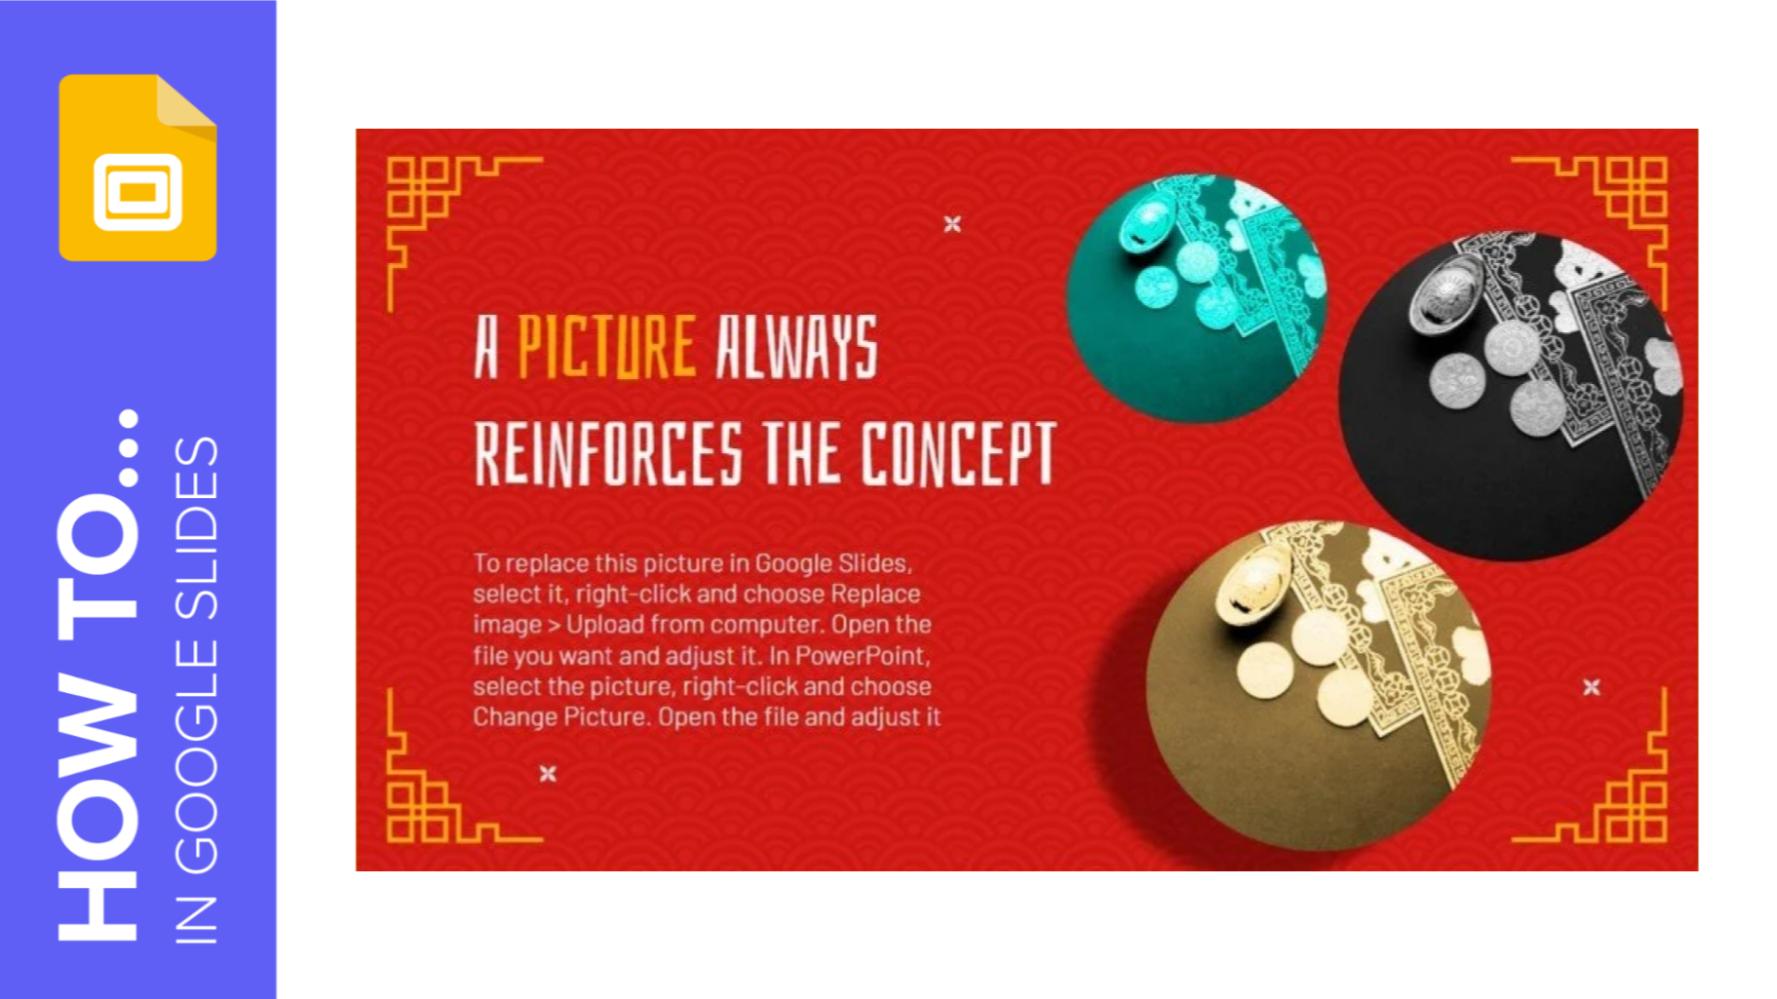 How to Apply Effects to an Image in Google Slides   Tutoriels et conseils pour vos présentations